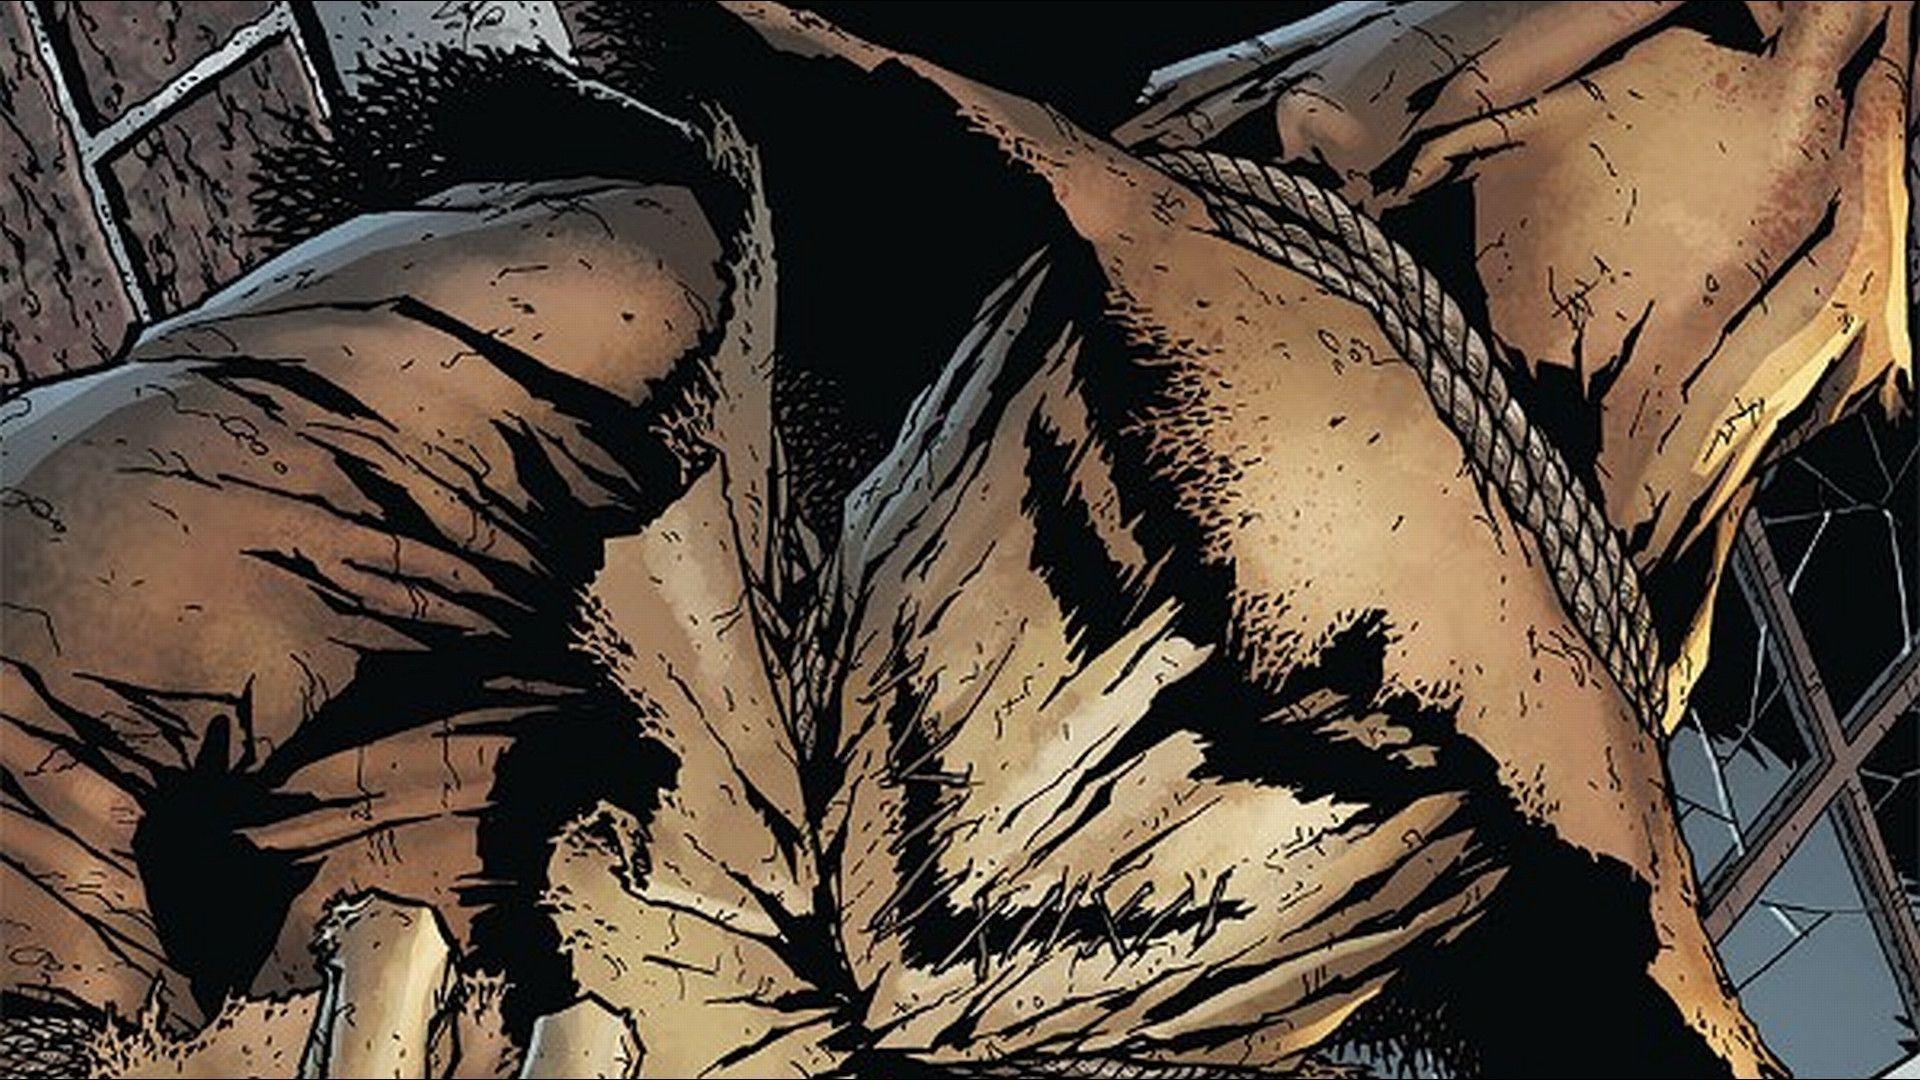 Batman Scarecrow Wallpapers 1920x1080